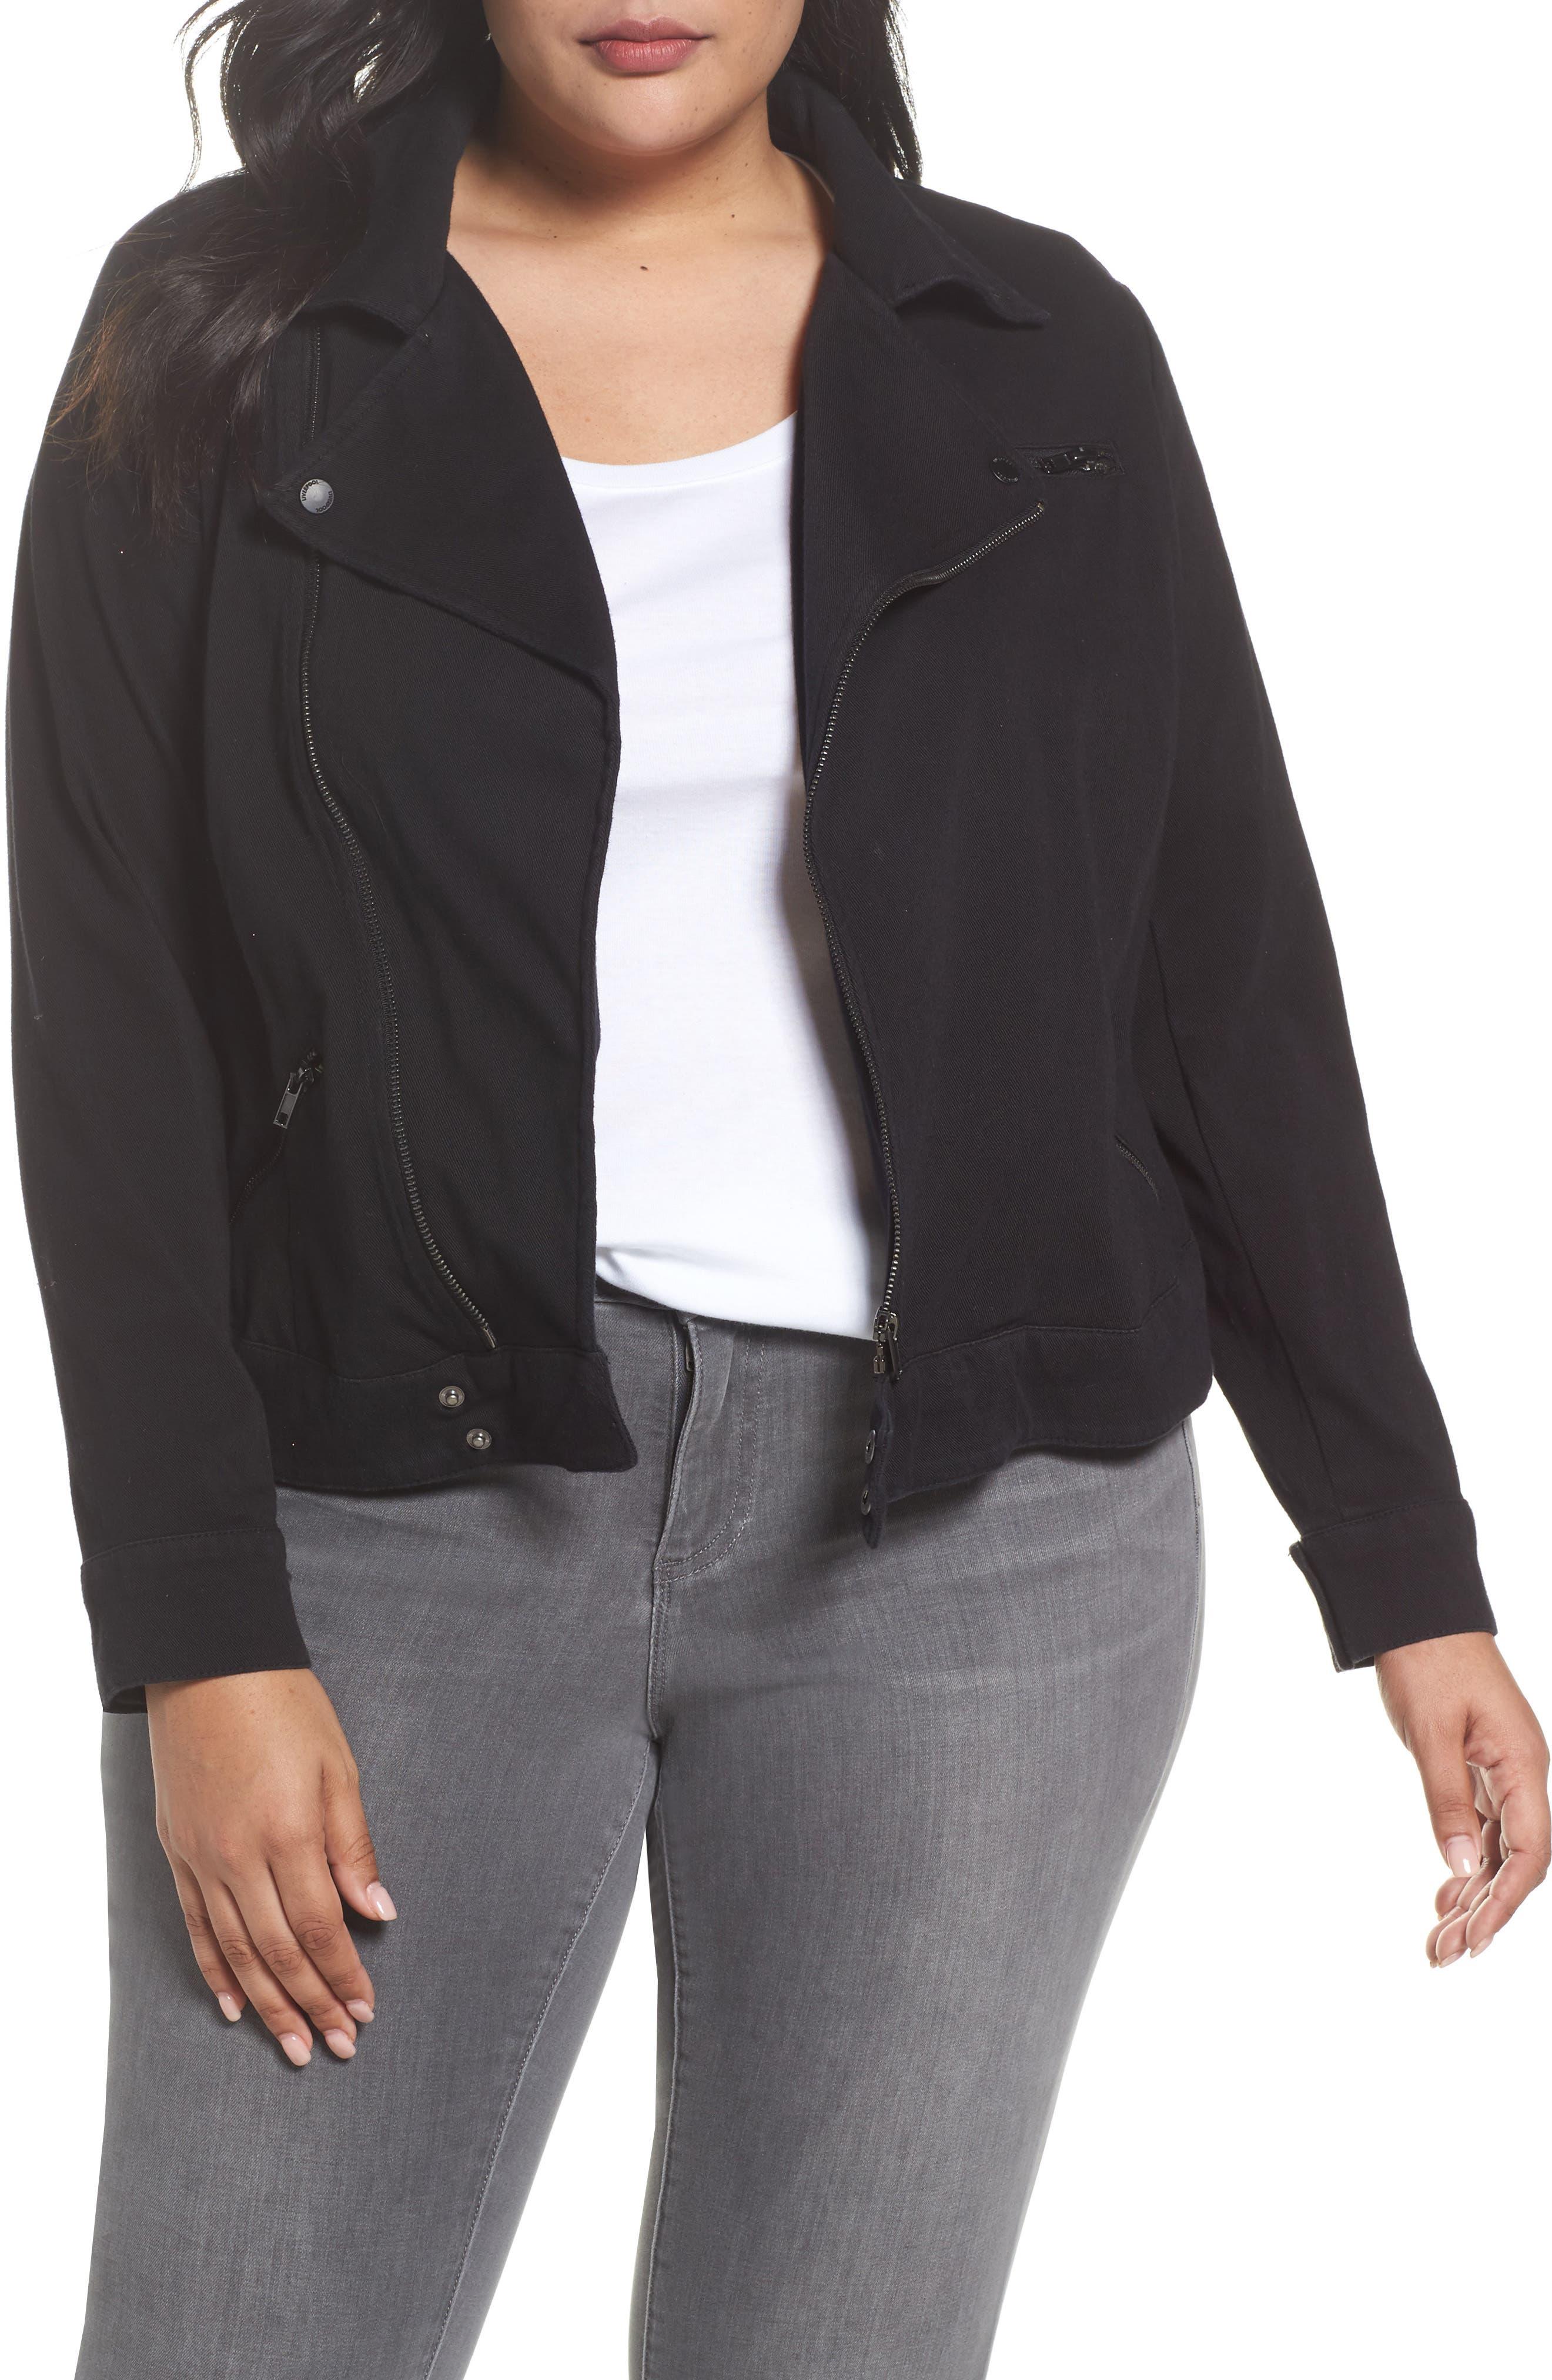 Main Image - Liverpool Jeans Company Zip Knit Moto Jacket (Plus Size)